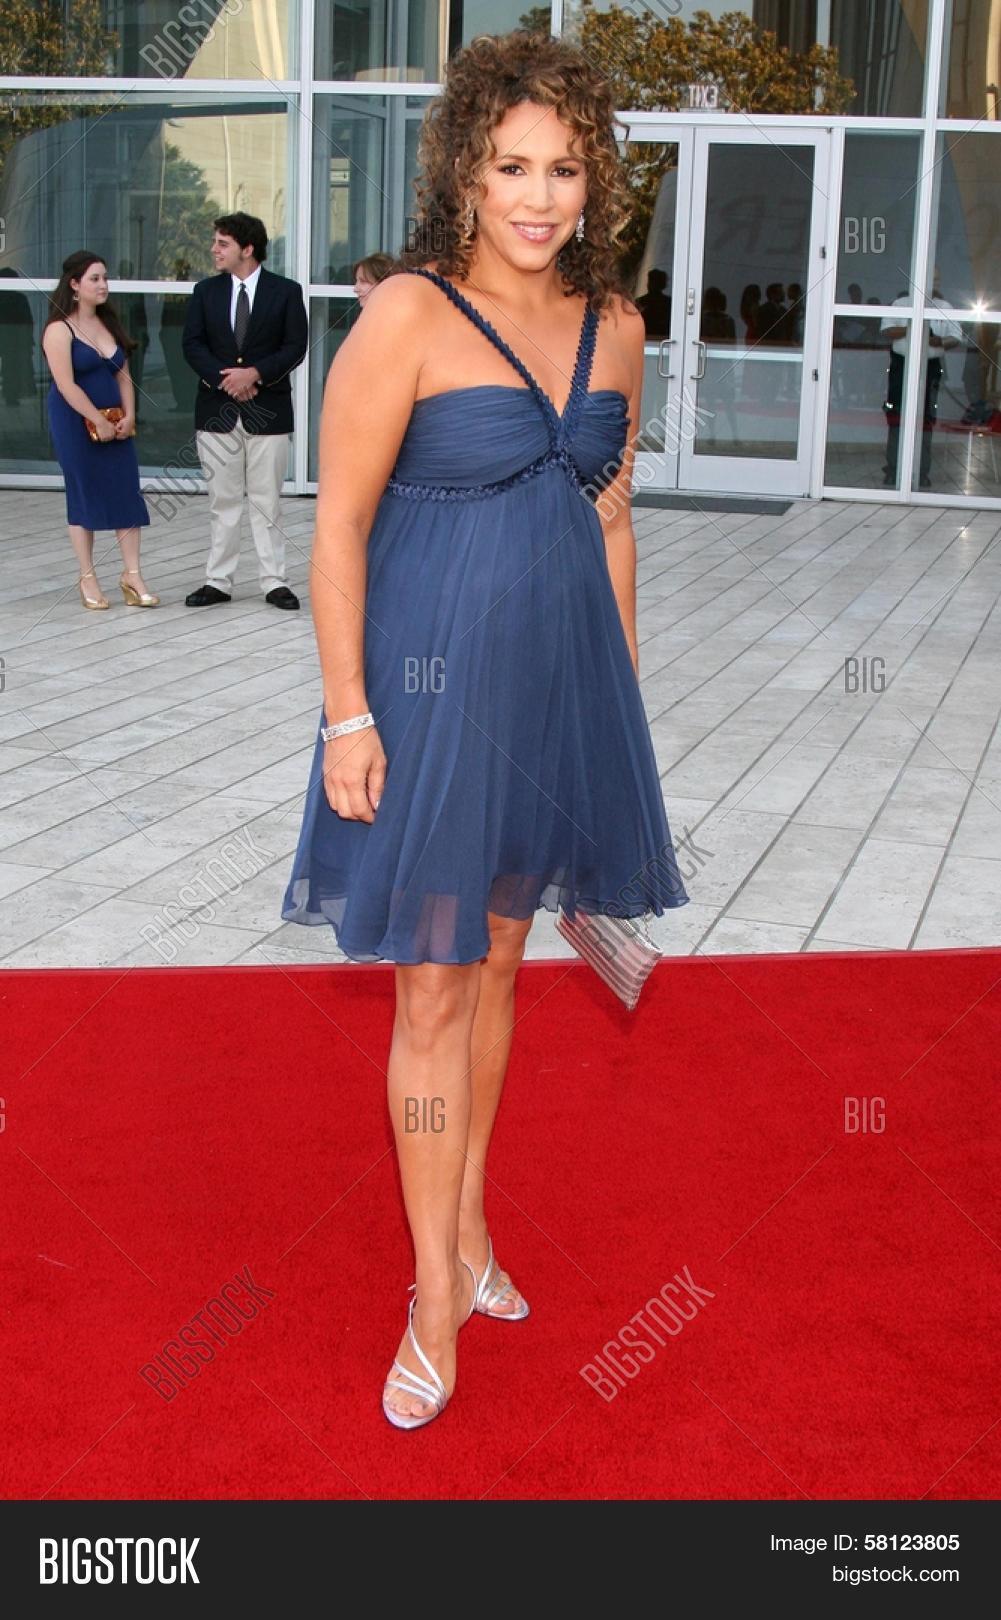 Geraldine Brooks (actress),Tamsin Egerton (born 1988) Porn picture Cathy Godbold,Ouida Bergere